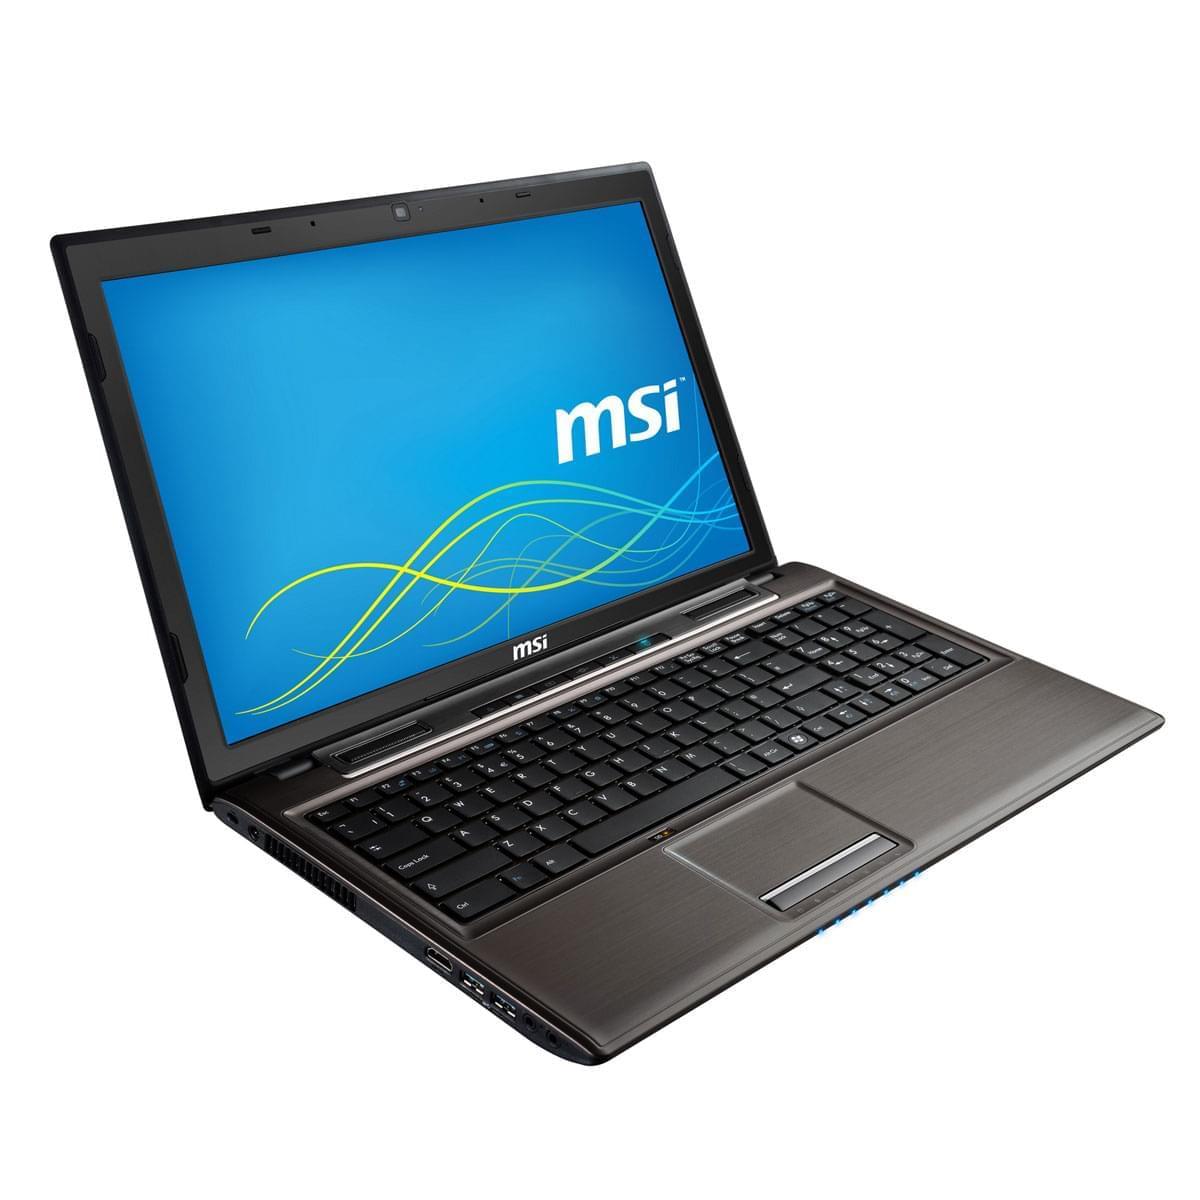 MSI 9S7-16GB11-057 - PC portable MSI - Cybertek.fr - 0